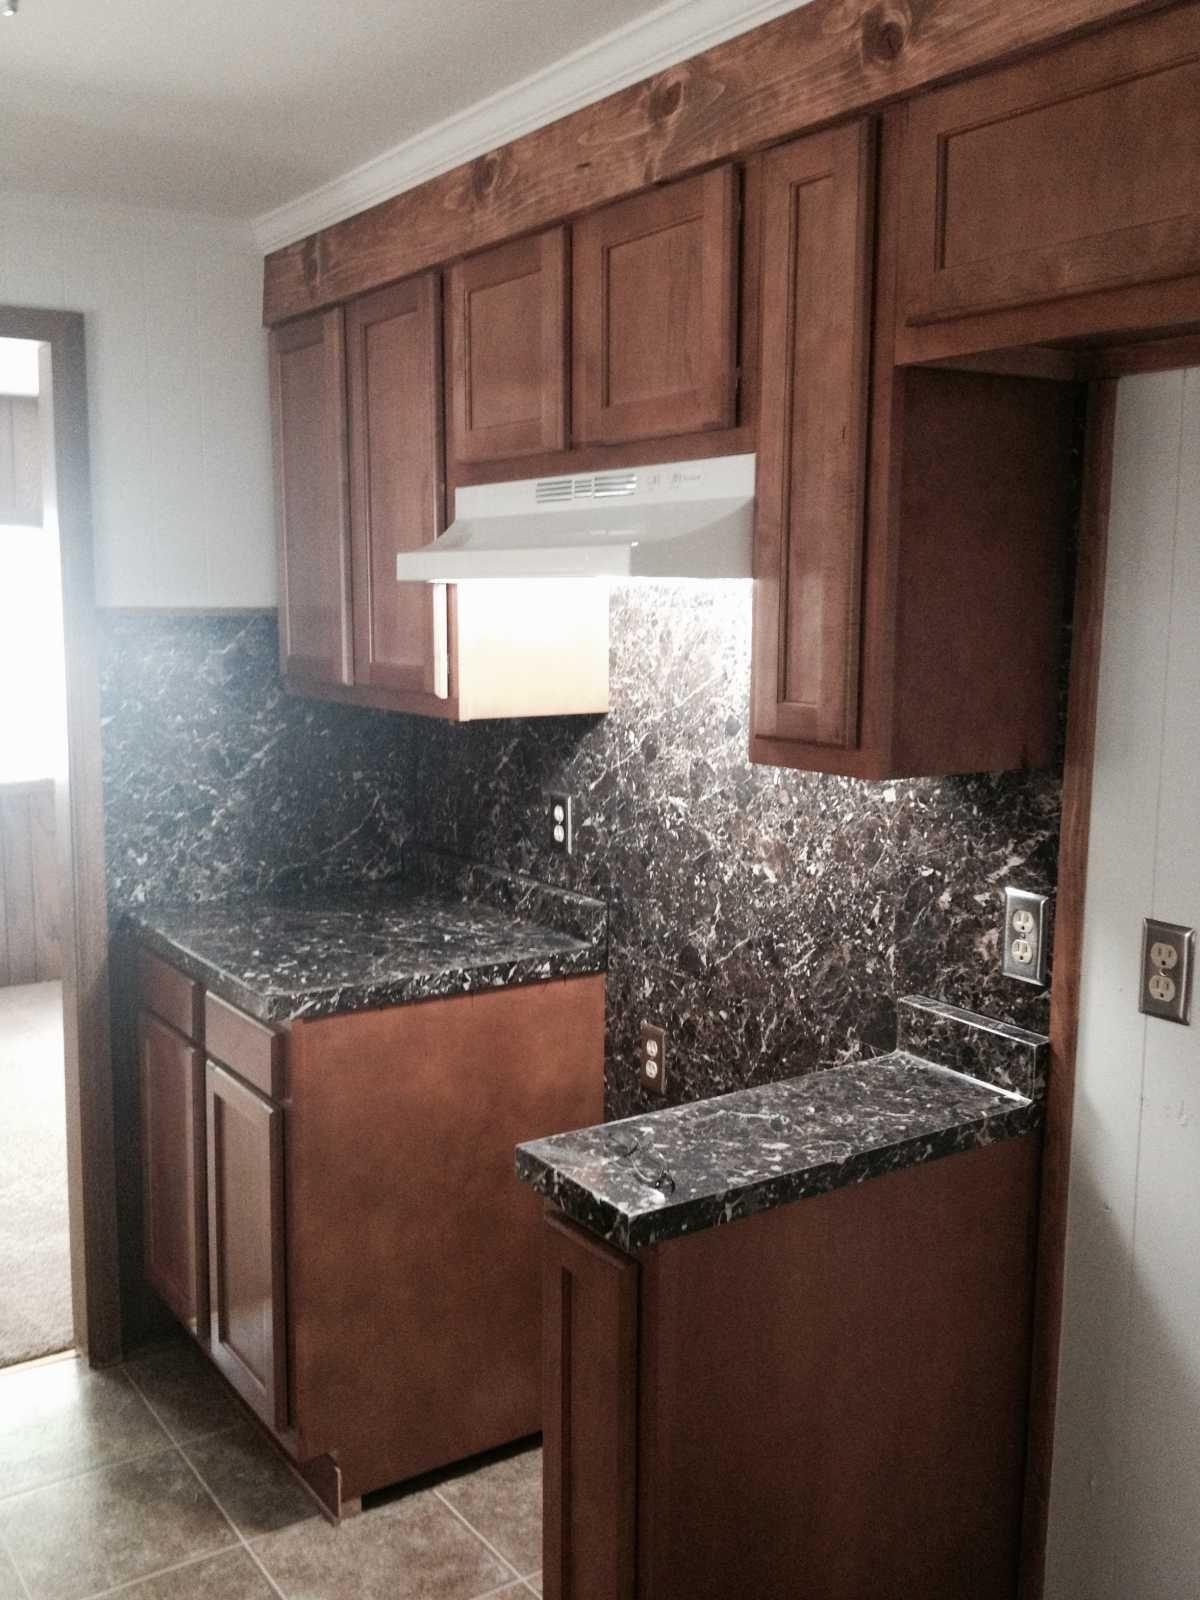 Marlette Mobile Home For Sale in Oakland MI, 48363